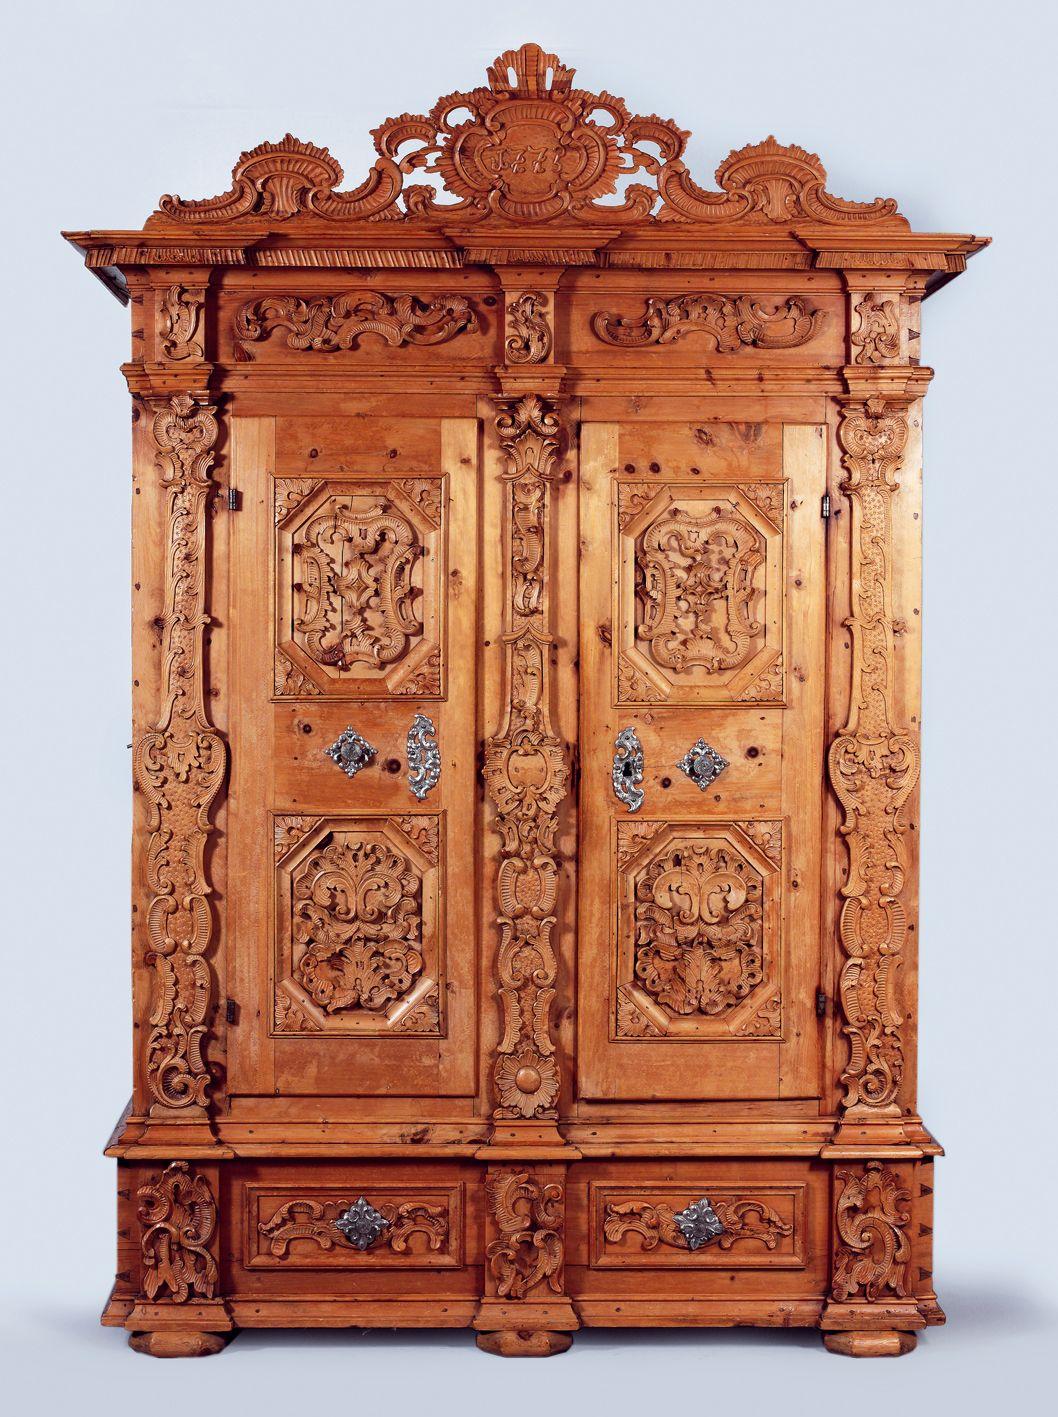 Splendid Museum Condition Pinzgau Rustic Coffer Dated 1775 Alte Schranke Angewandte Kunst Kasten